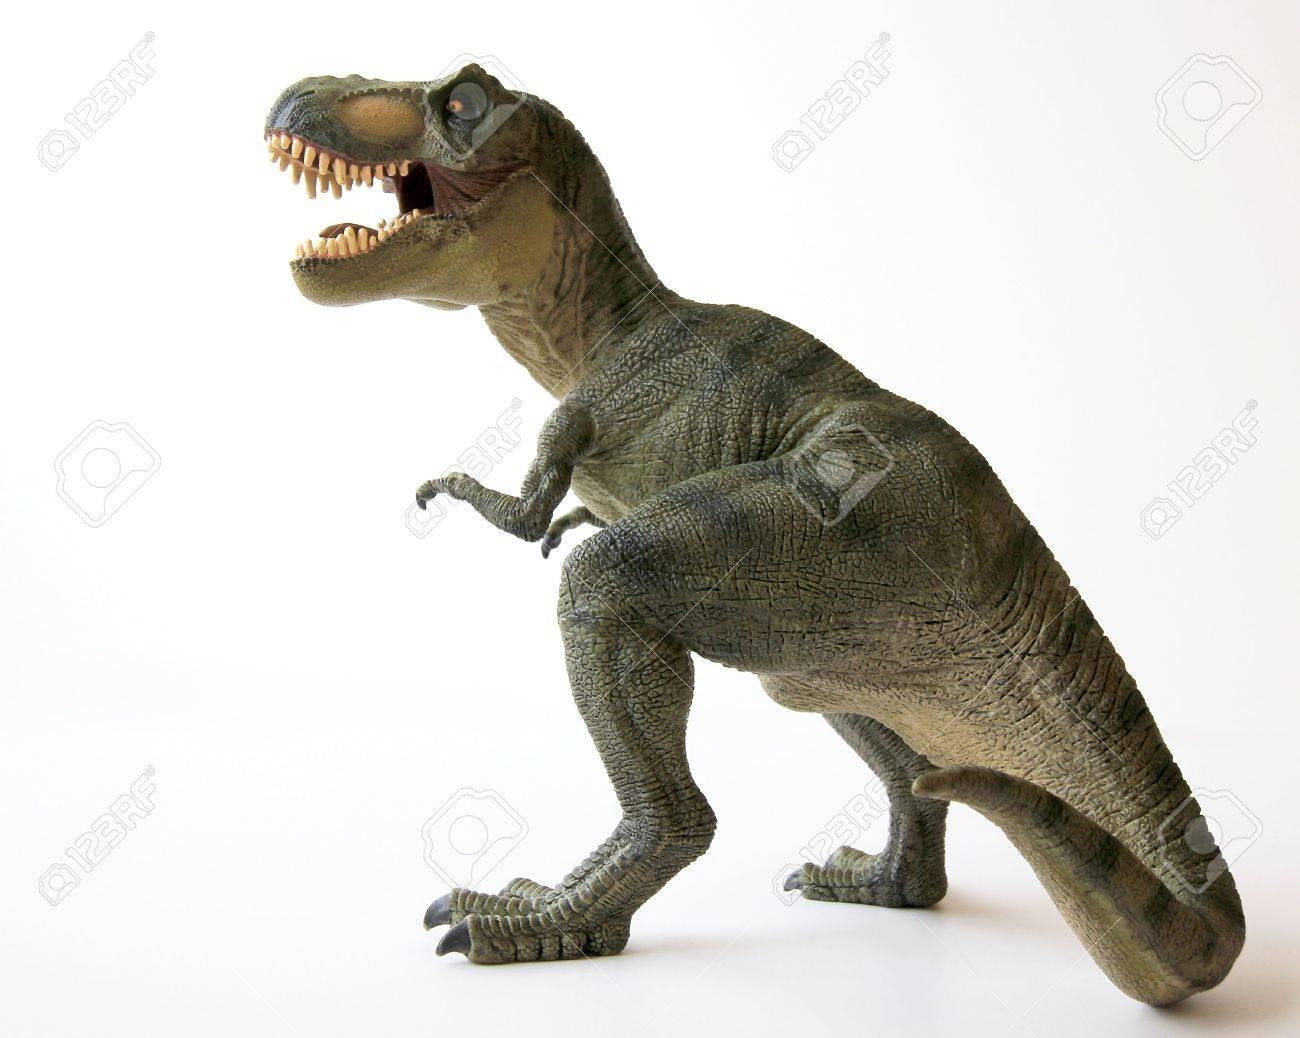 A Tyrannosaurus Rex Dinosaur with Gaping Jaws Full of Sharp Teeth - 9010381